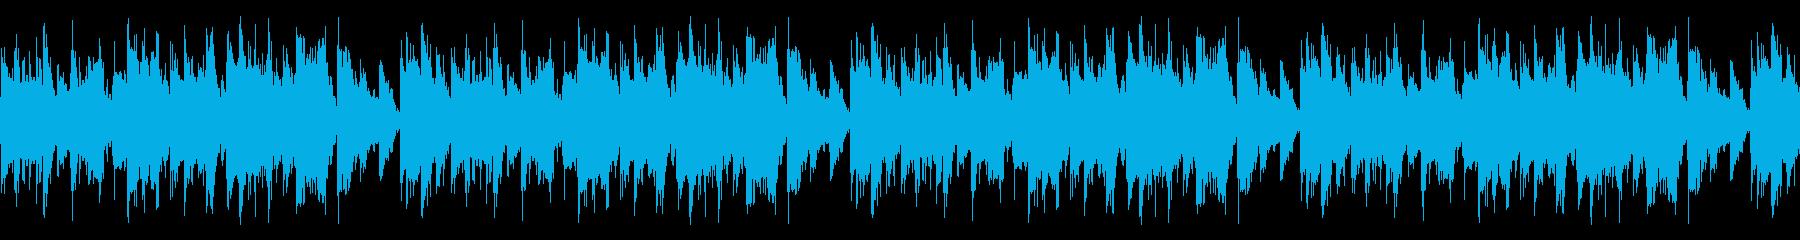 TOE-TAPPING LOOPの再生済みの波形